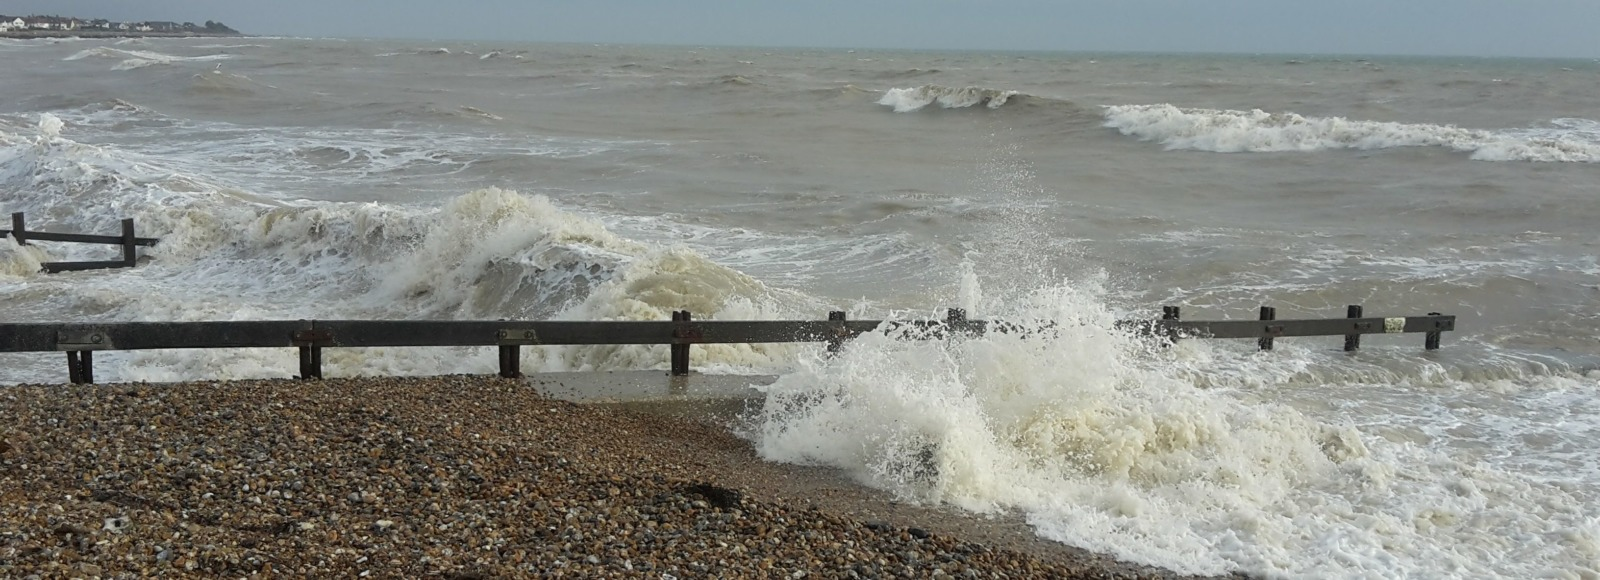 Rough seas in Felpham